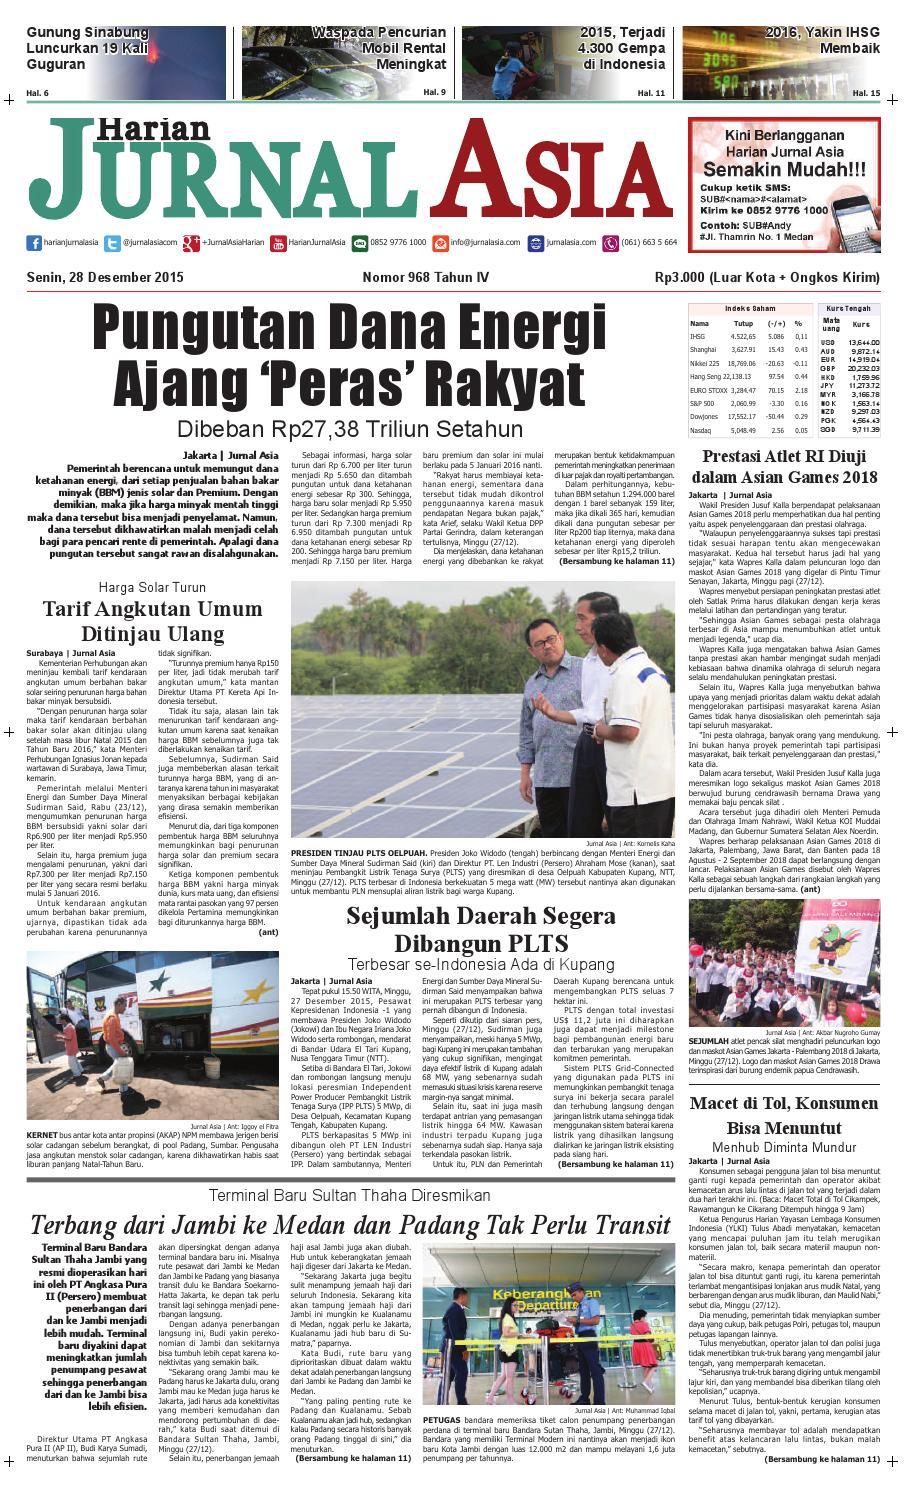 Harian Jurnal Asia Edisi Senin 28 Desember 2015 By Parcel Makanan Ampamp Kristal Pja 1609 Medan Issuu